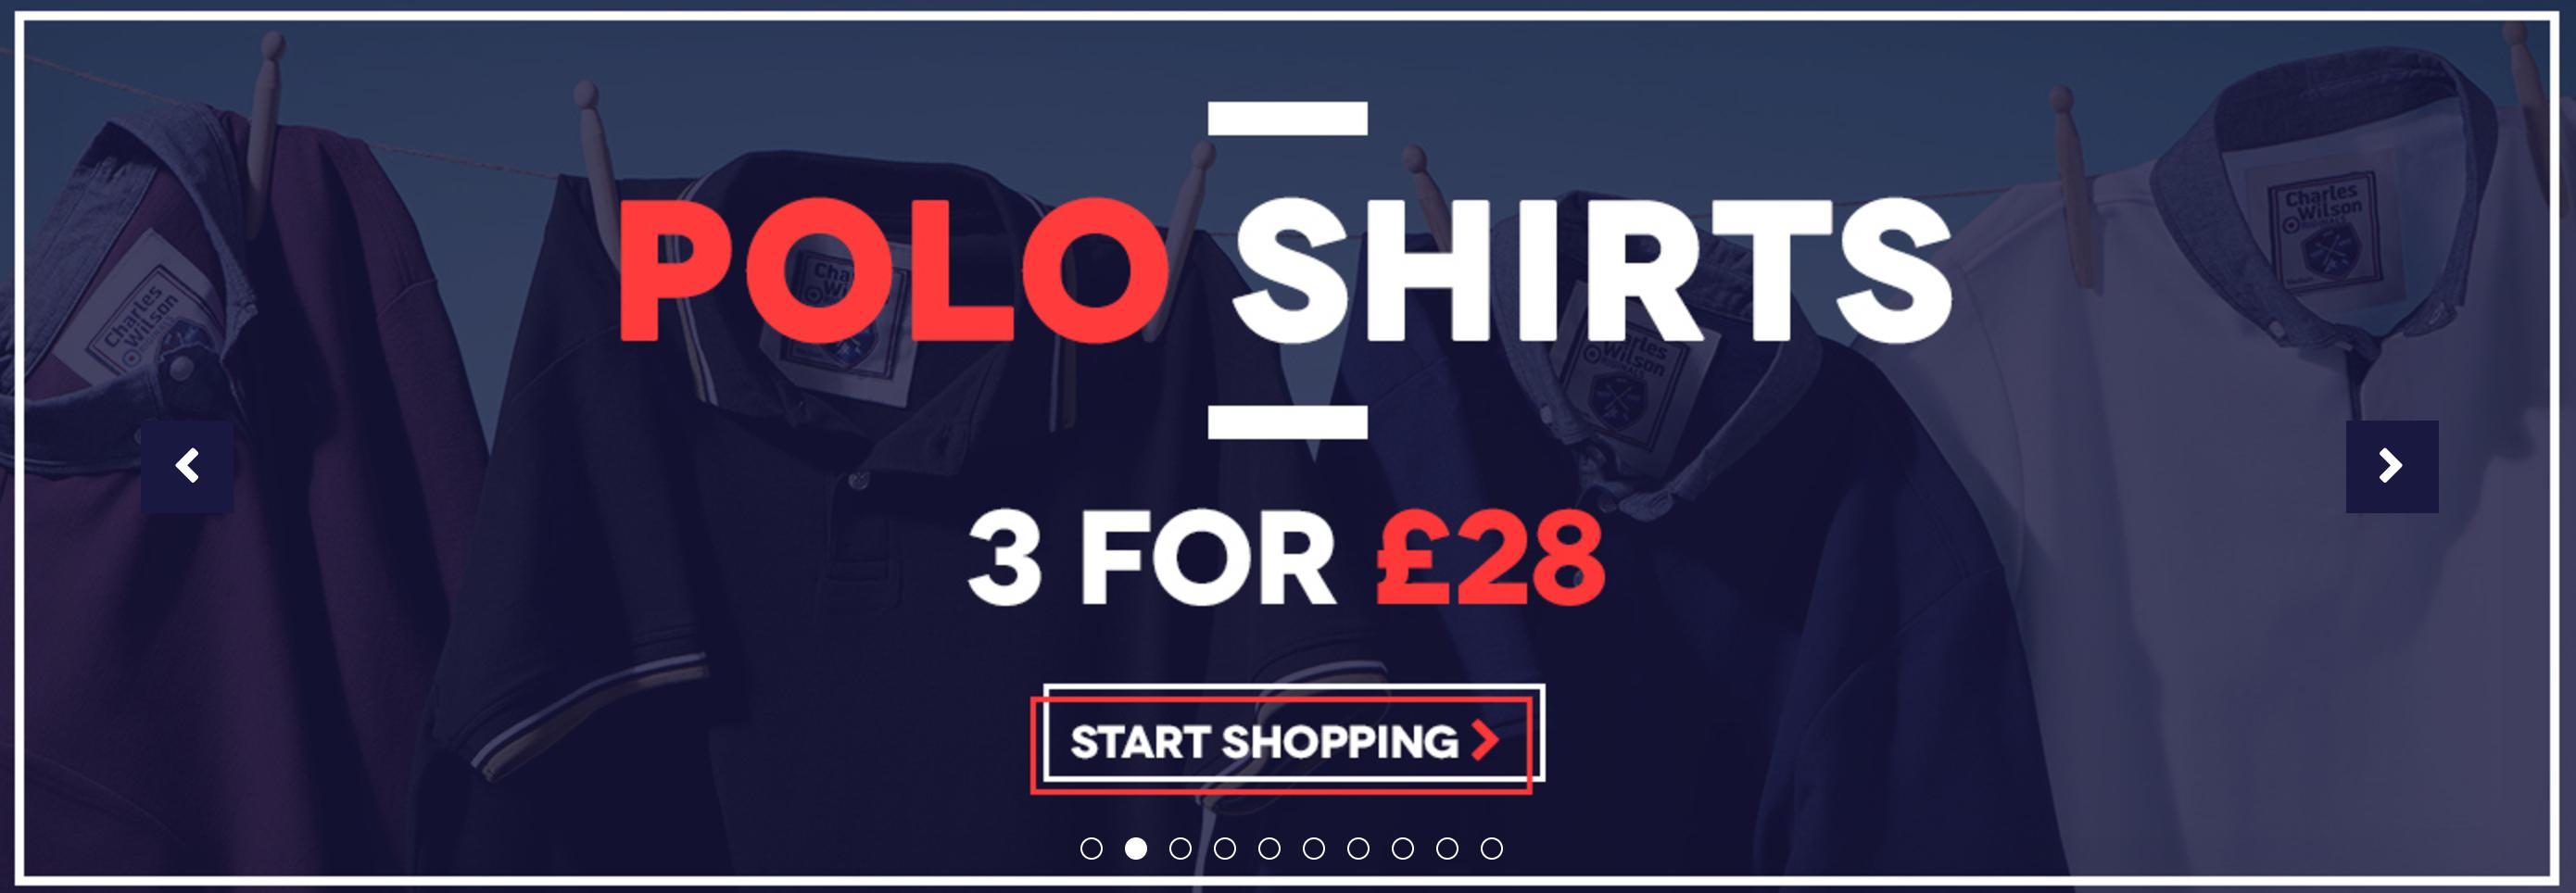 Charles Wilson Charles Wilson: 3 for £28 on polo shirts